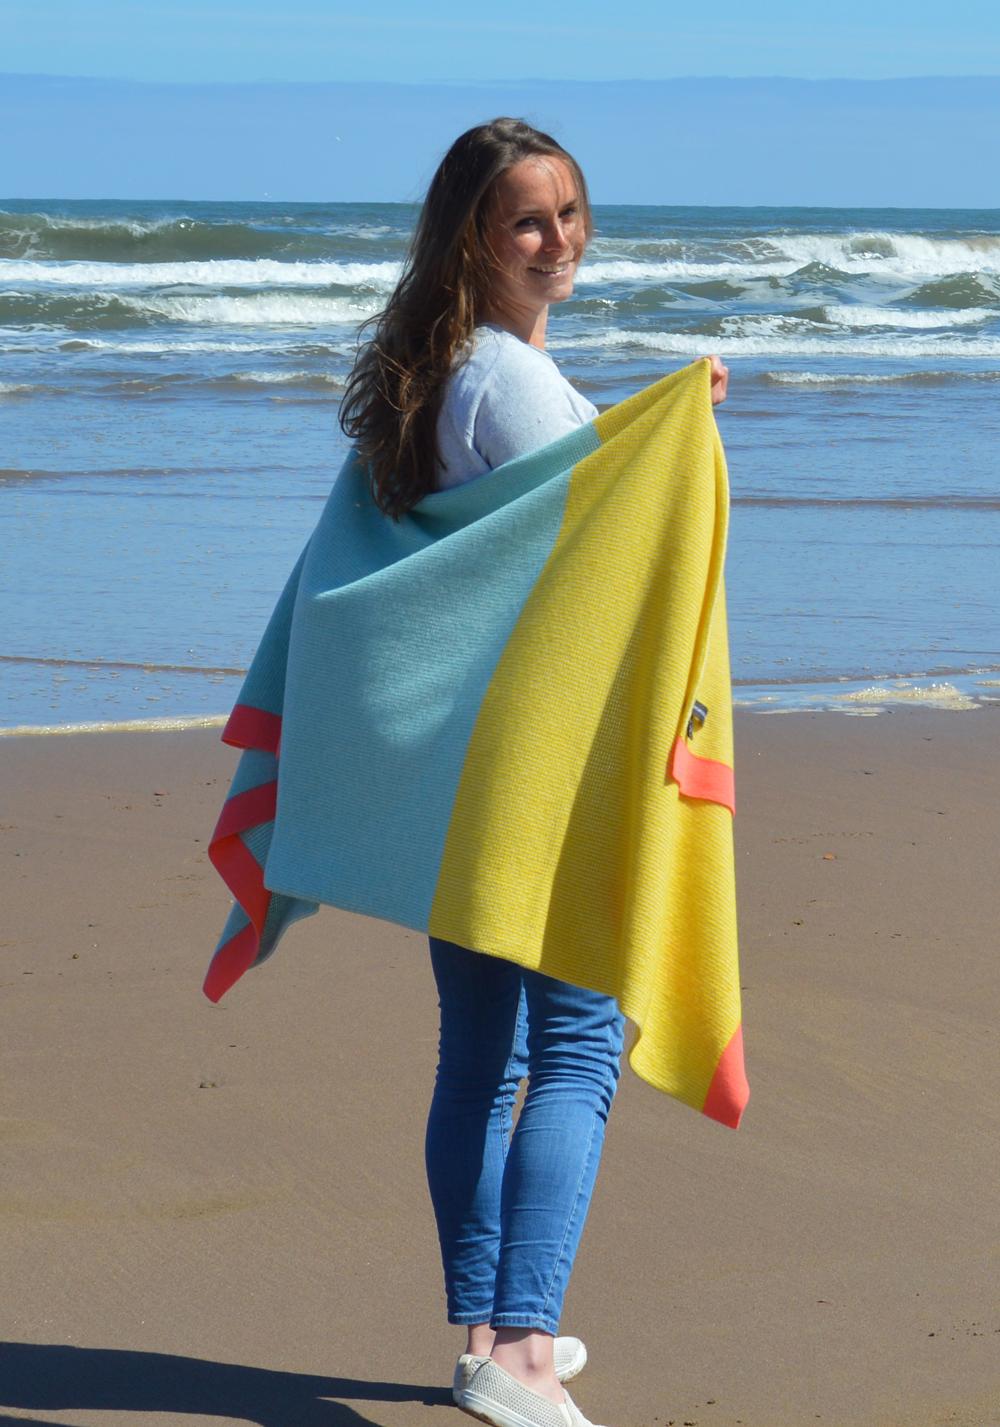 The finished Erraid blanket scarf.